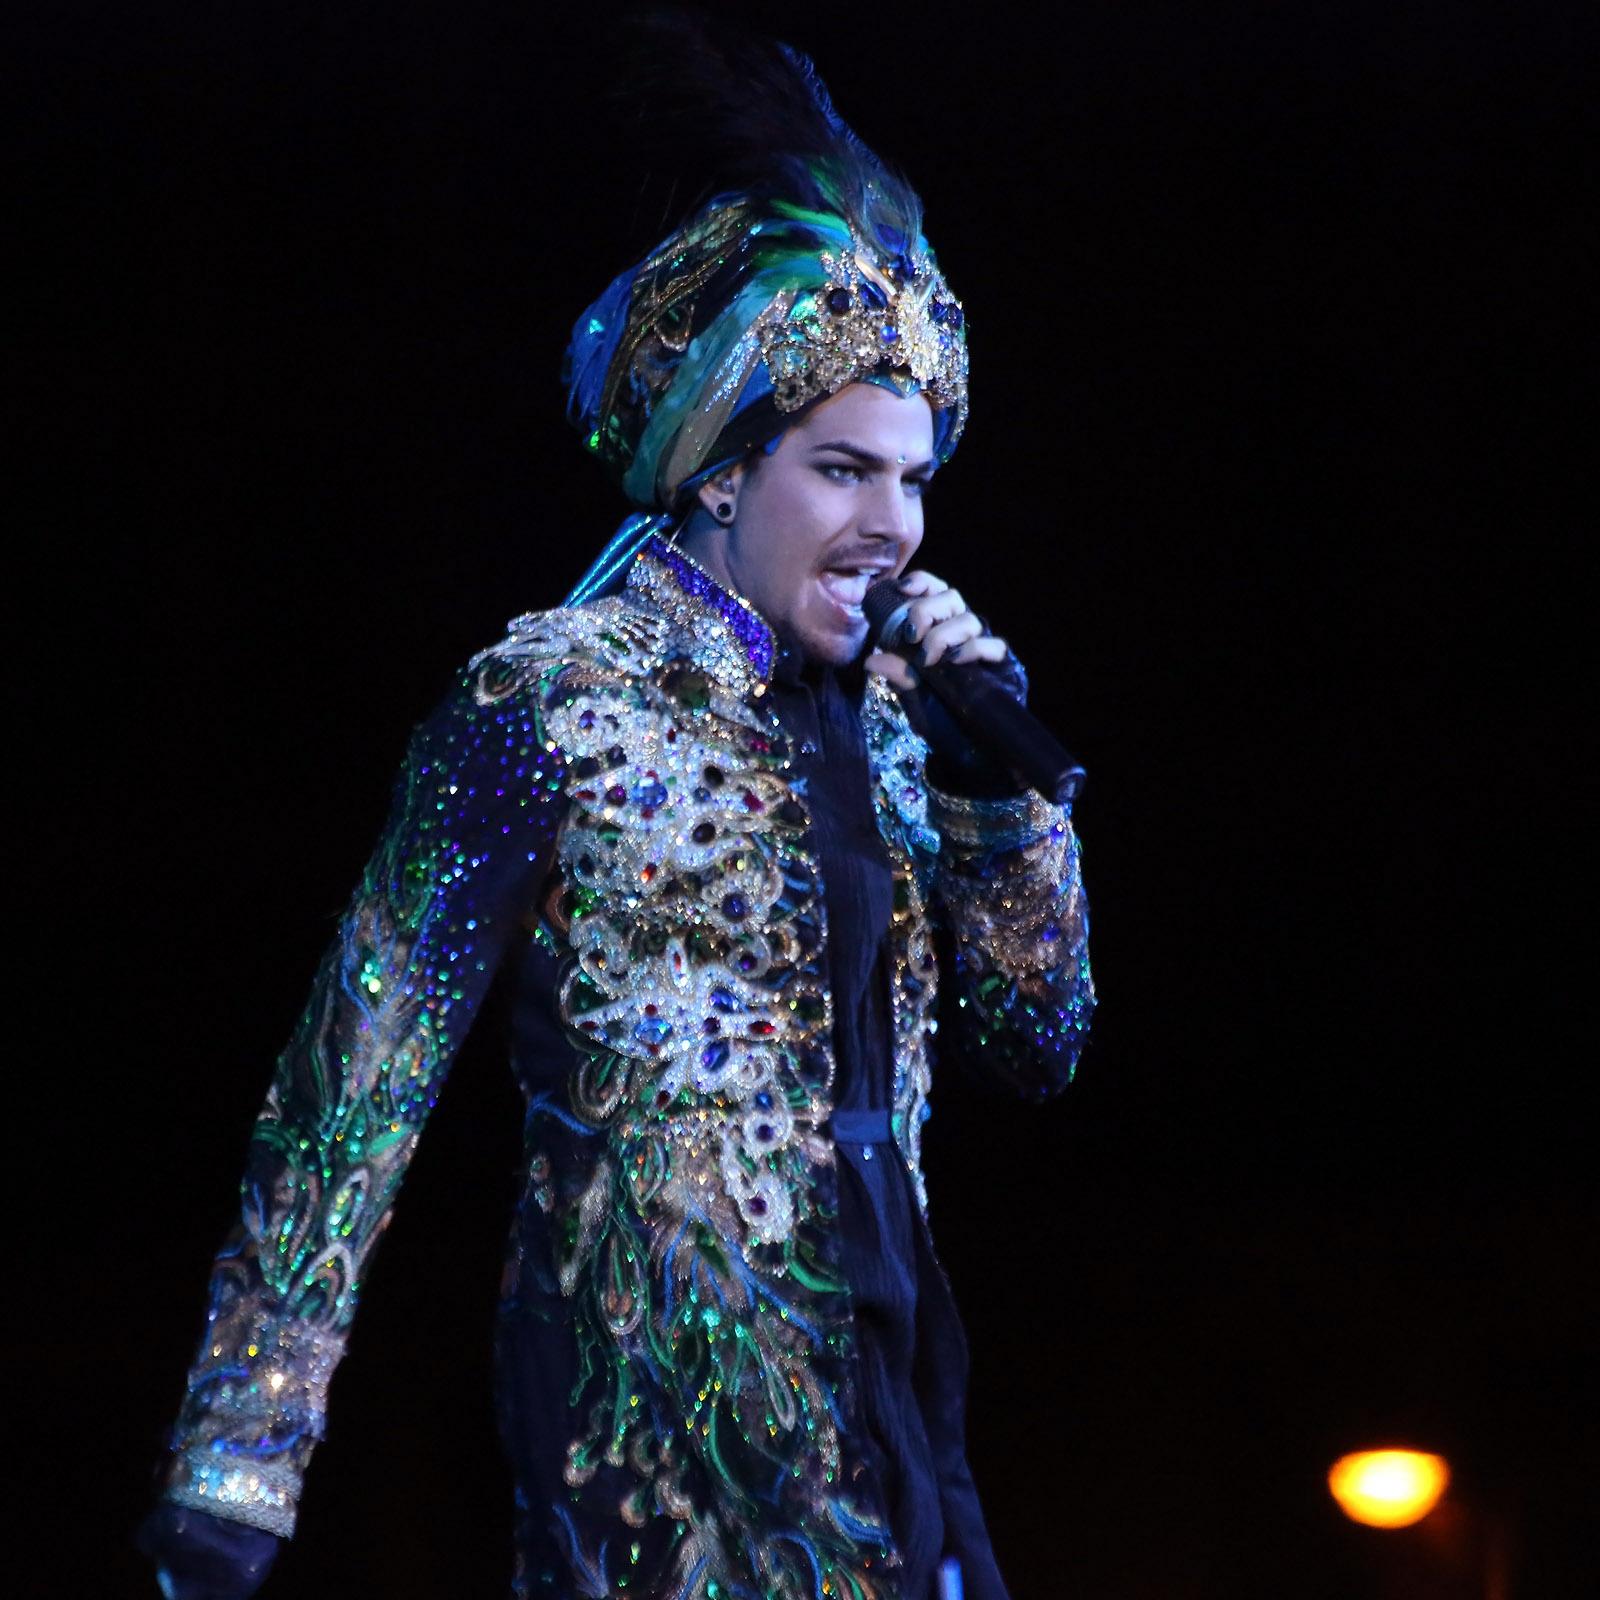 Adam Lambert on Stage